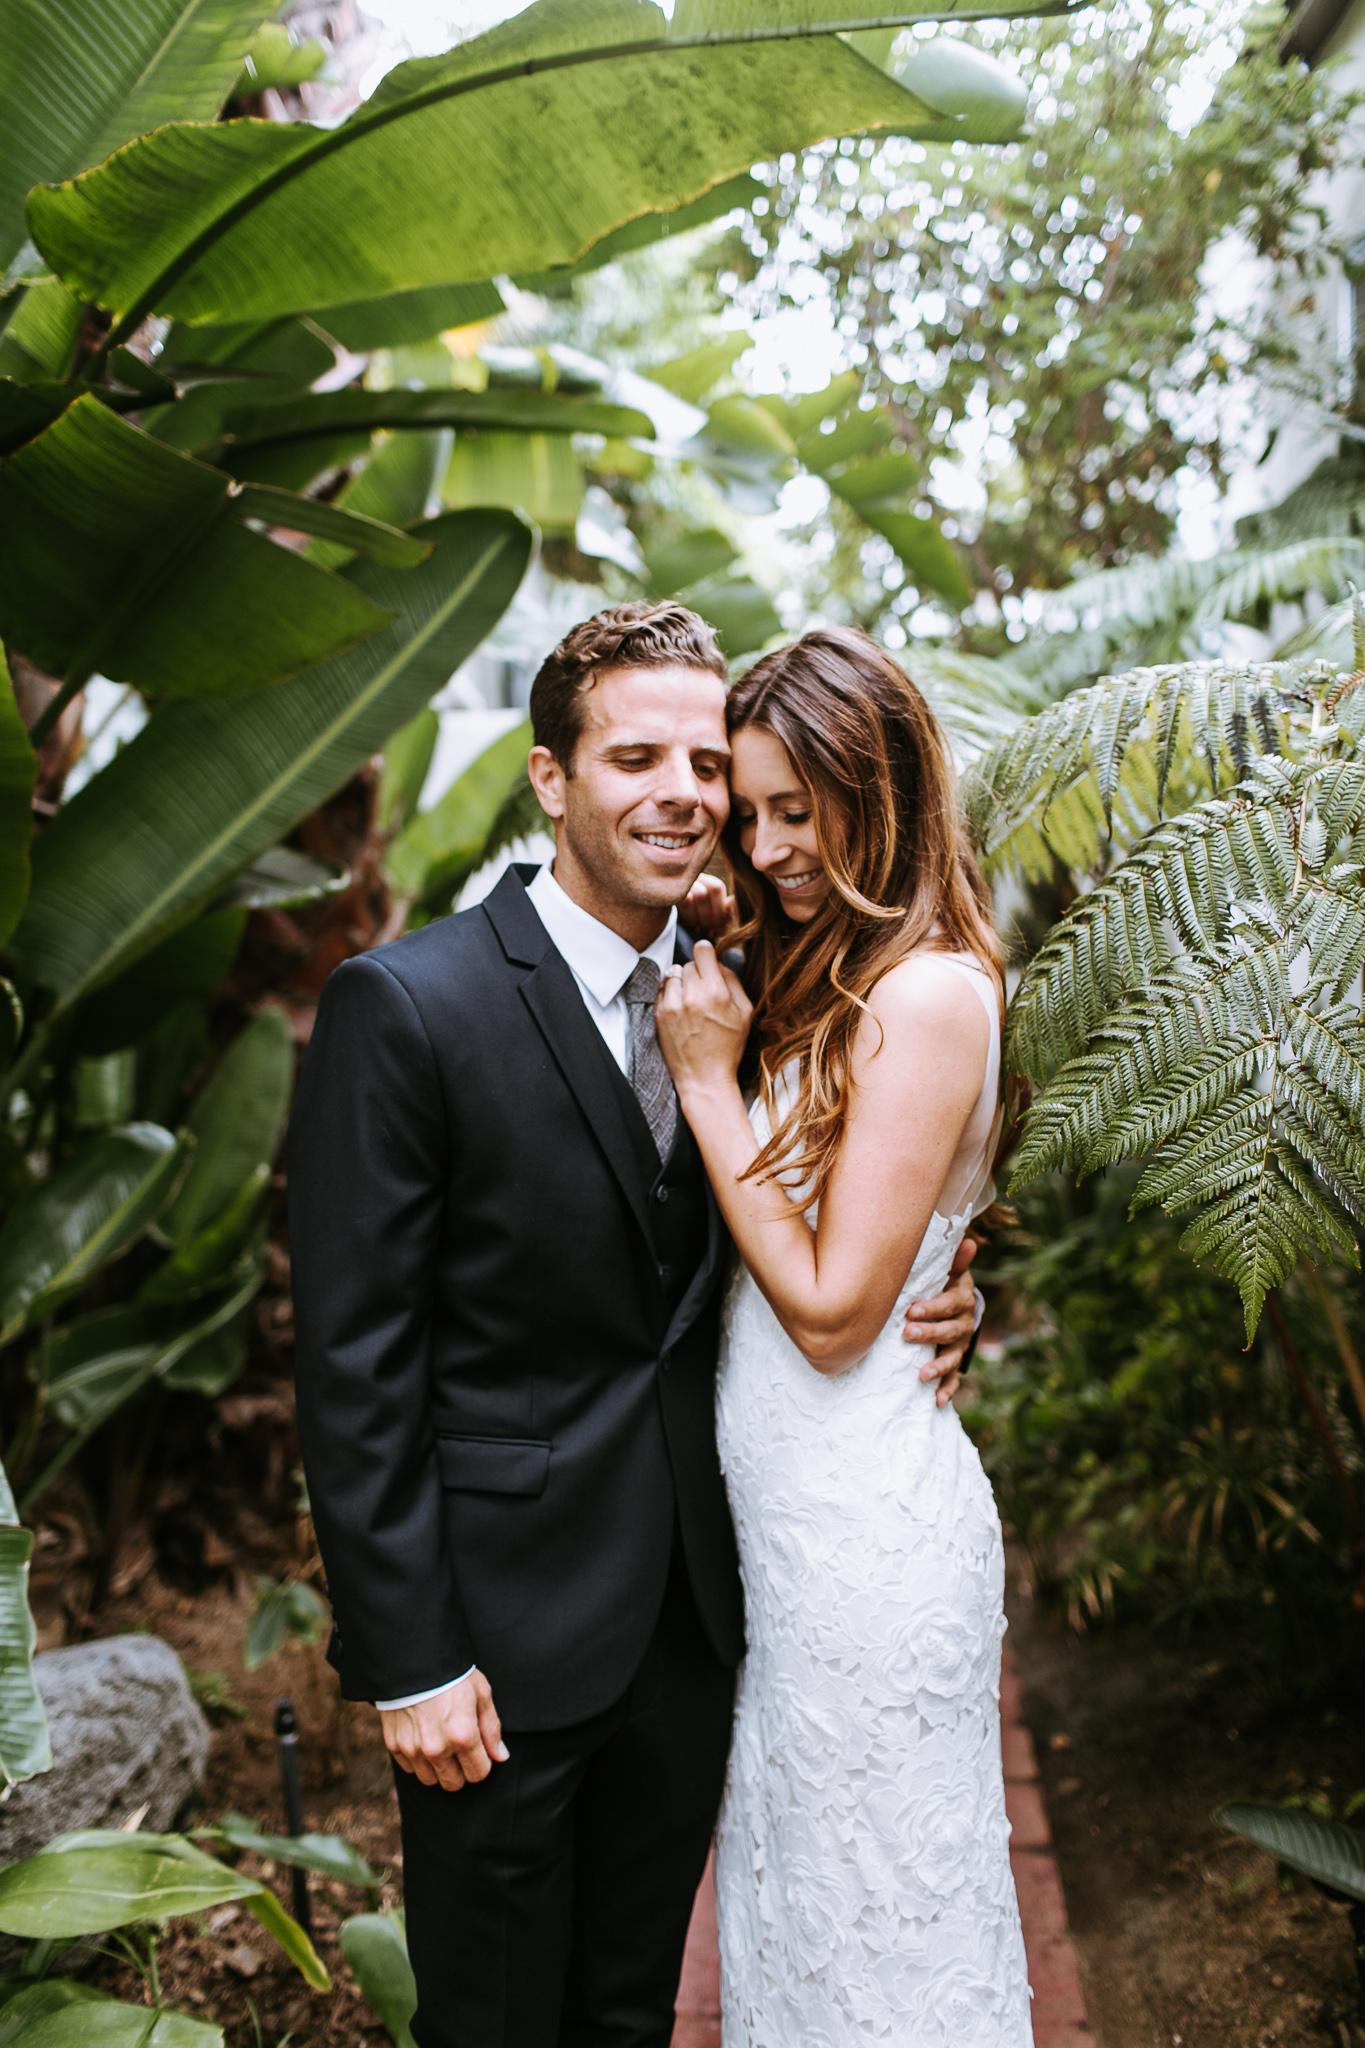 LagunaBeach-WeddingPhotographer-20.jpg